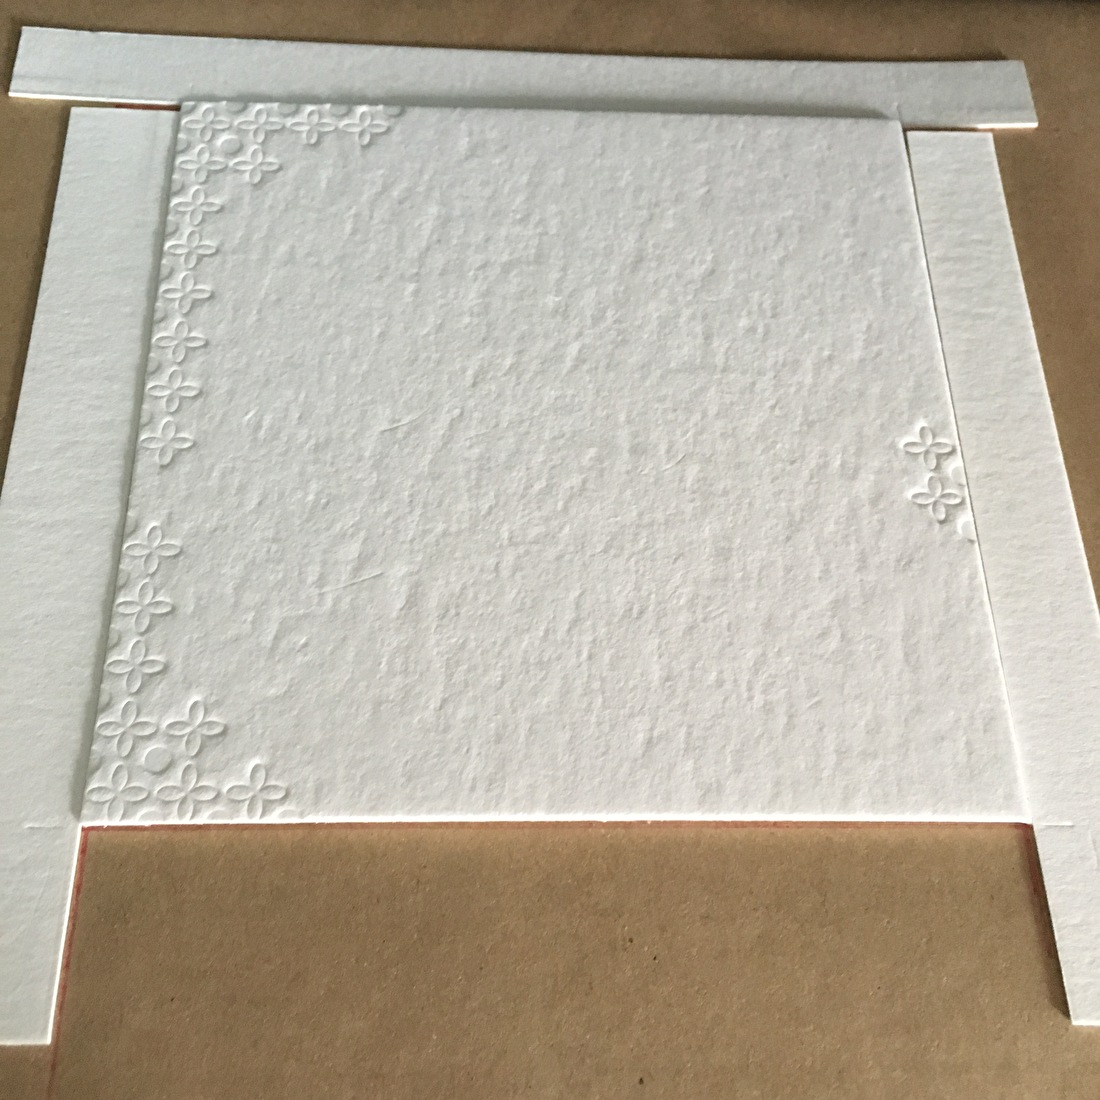 Wat is blinddruk? trouwkaart, geboortekaartje, blind druk, letterpress, goedkoop